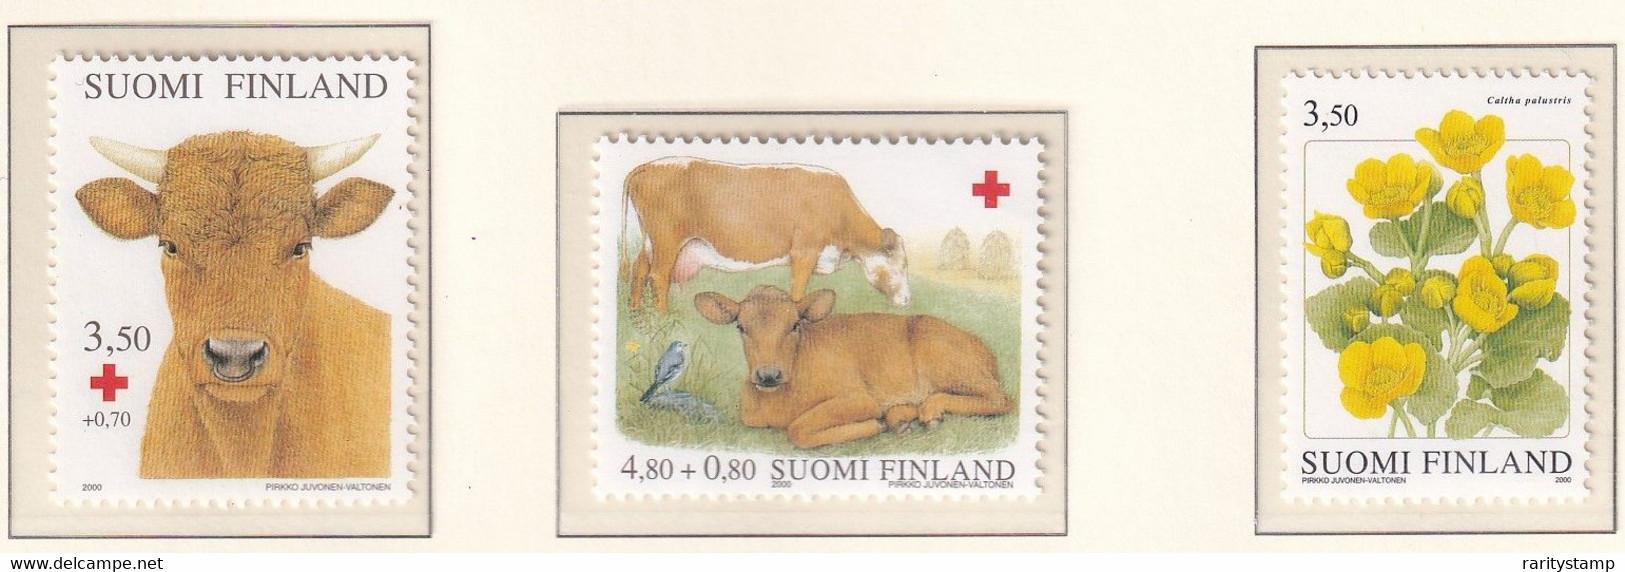 FINLANDIA 2000 PRO CROCE ROSSA 1495/96 MNH** - Nuevos